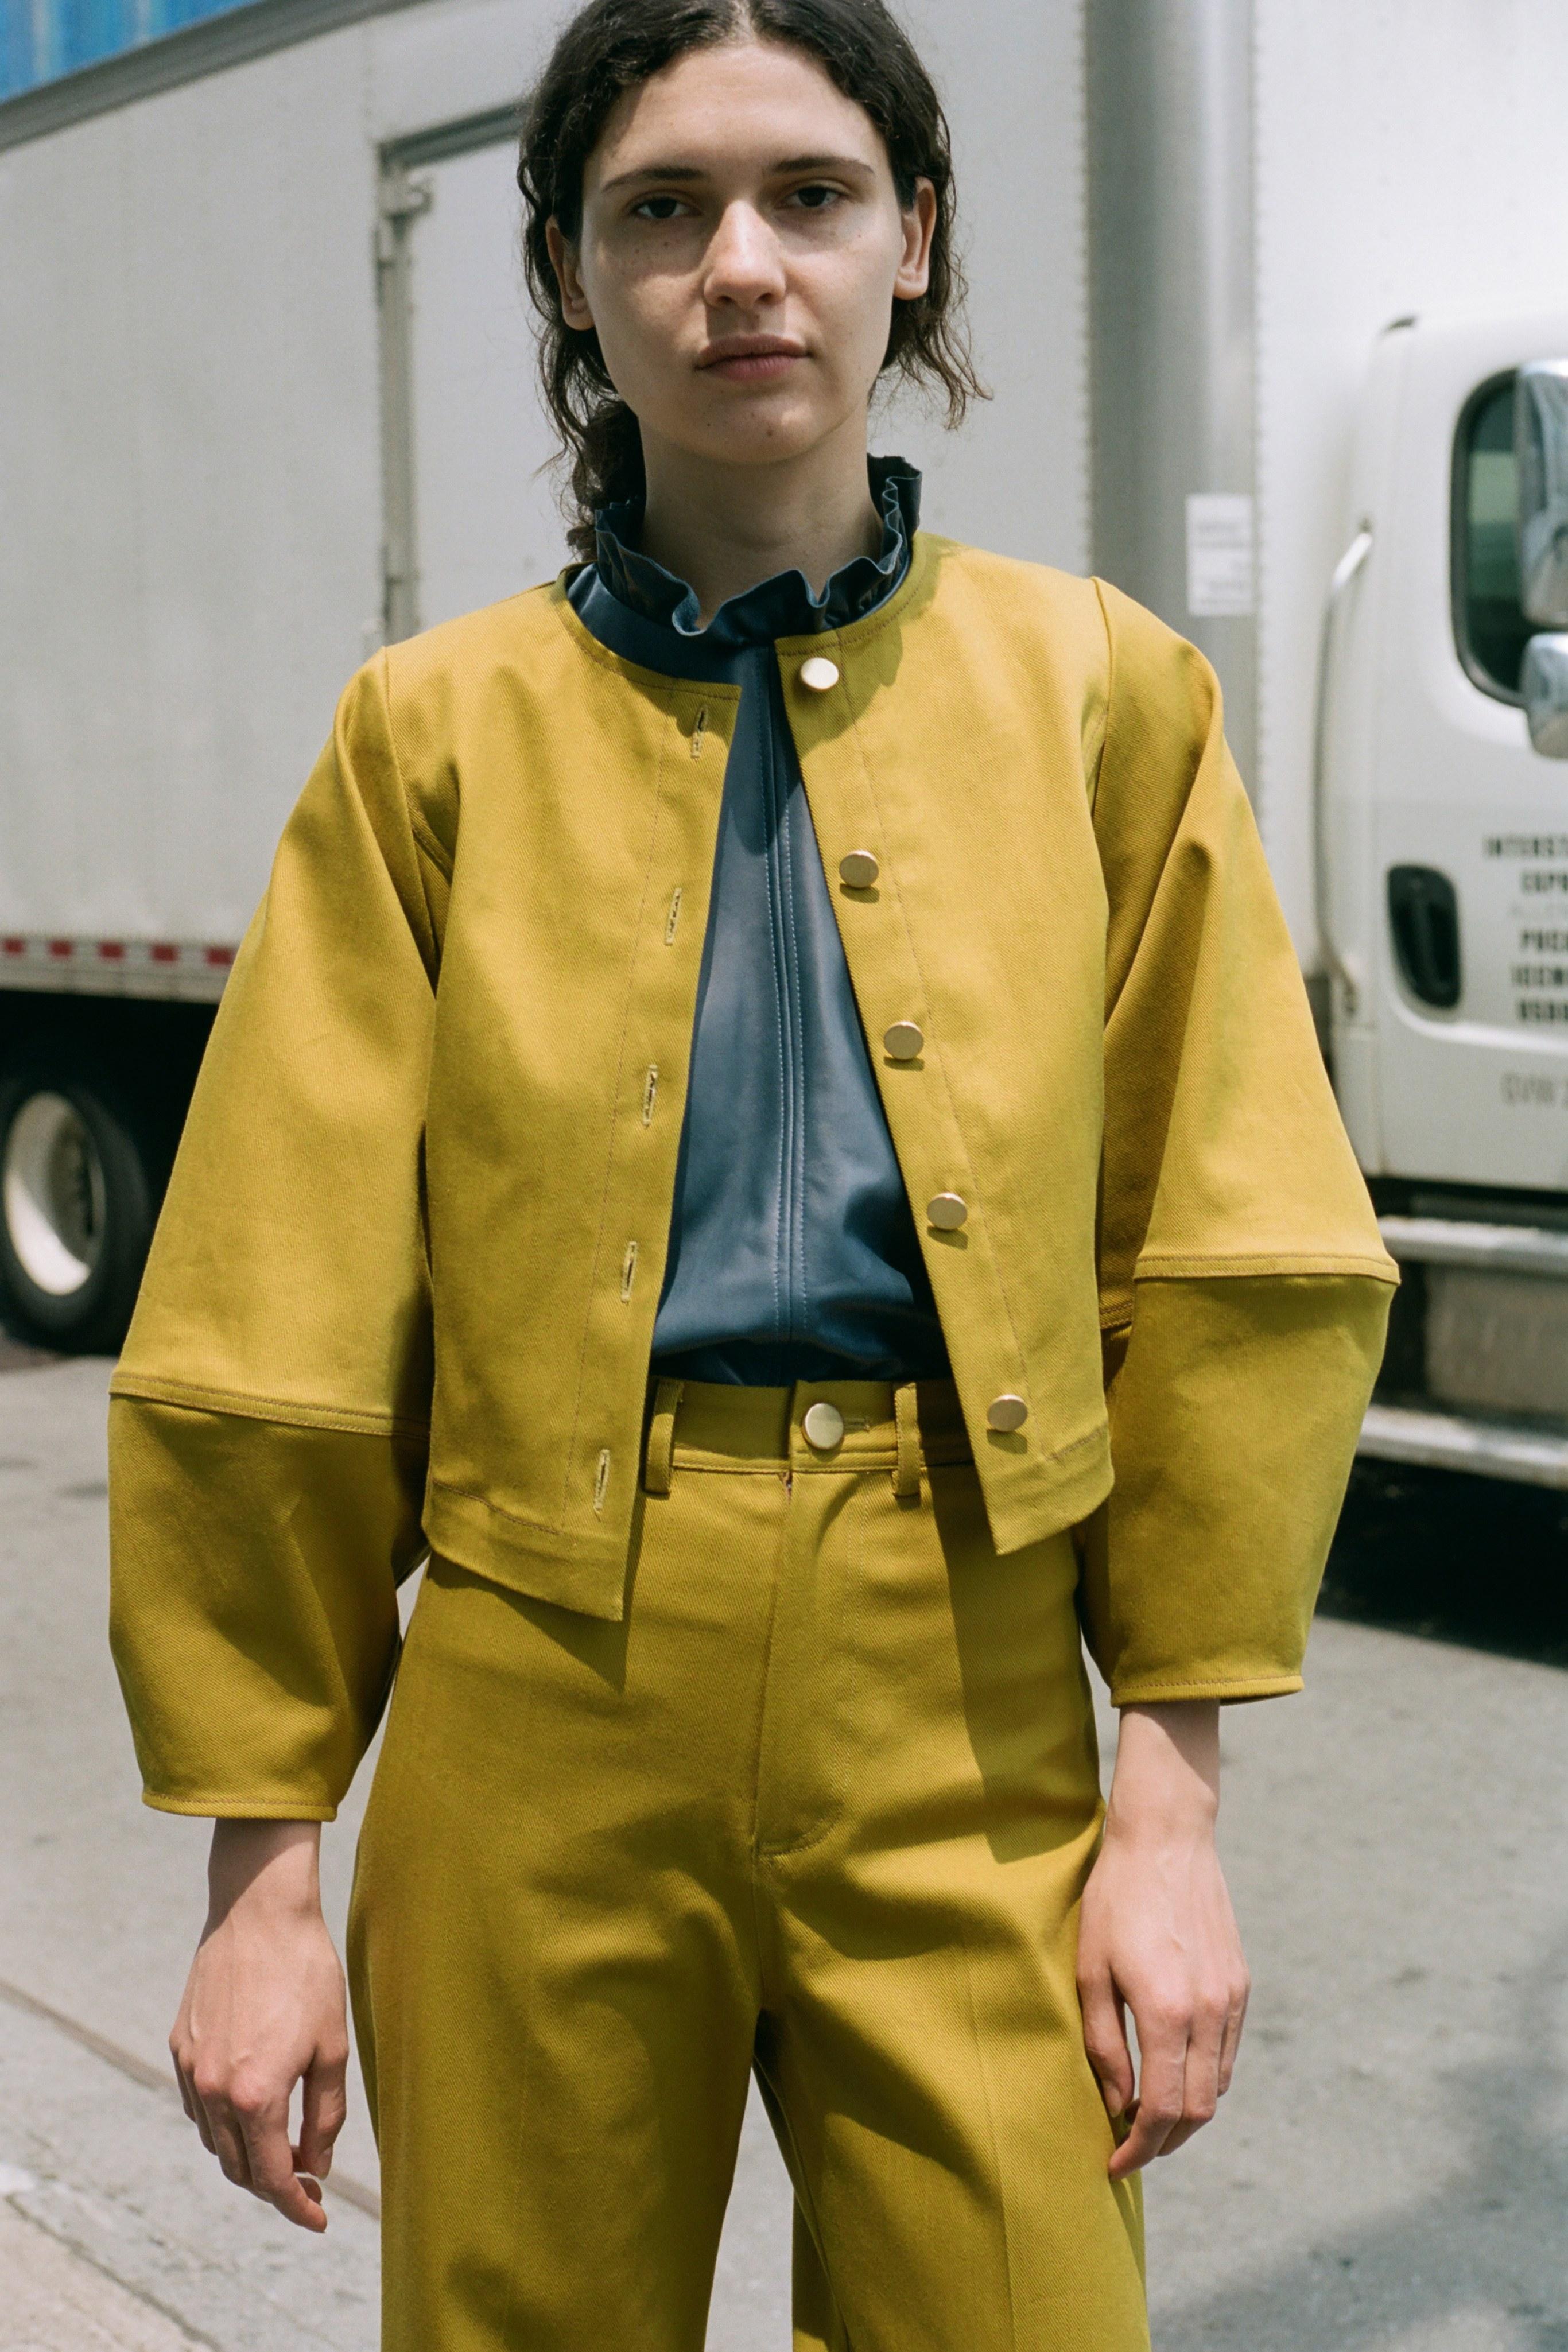 Corbin color denim jacket, Lydia leather blouse, Corbin color denim cuff pant